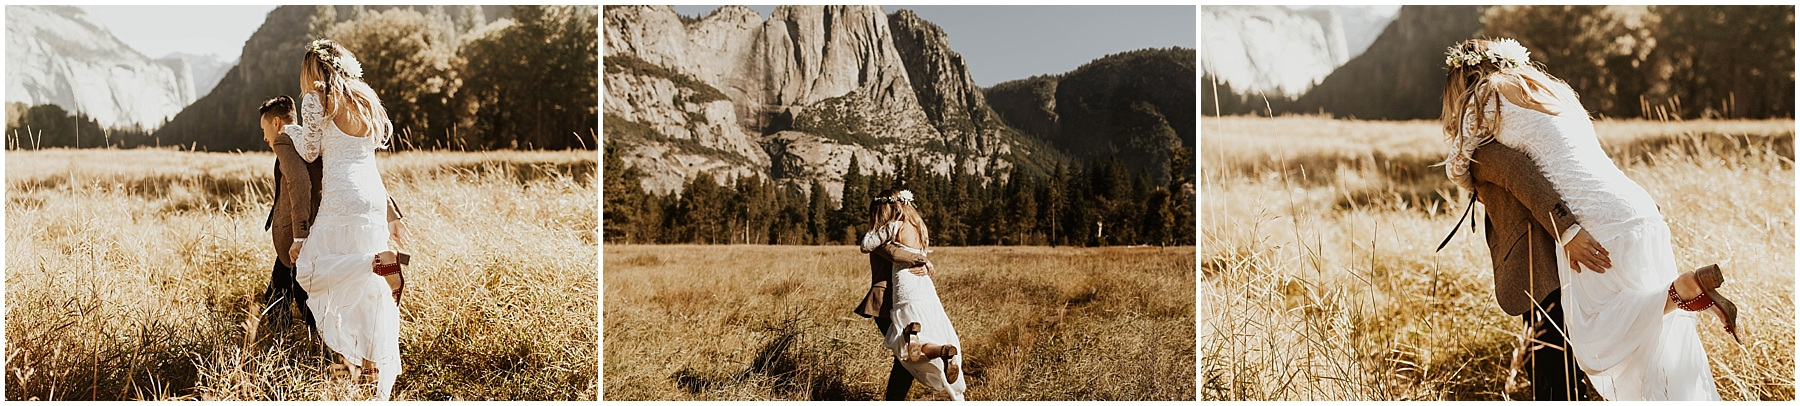 Yosemite_elopement_0070.jpg